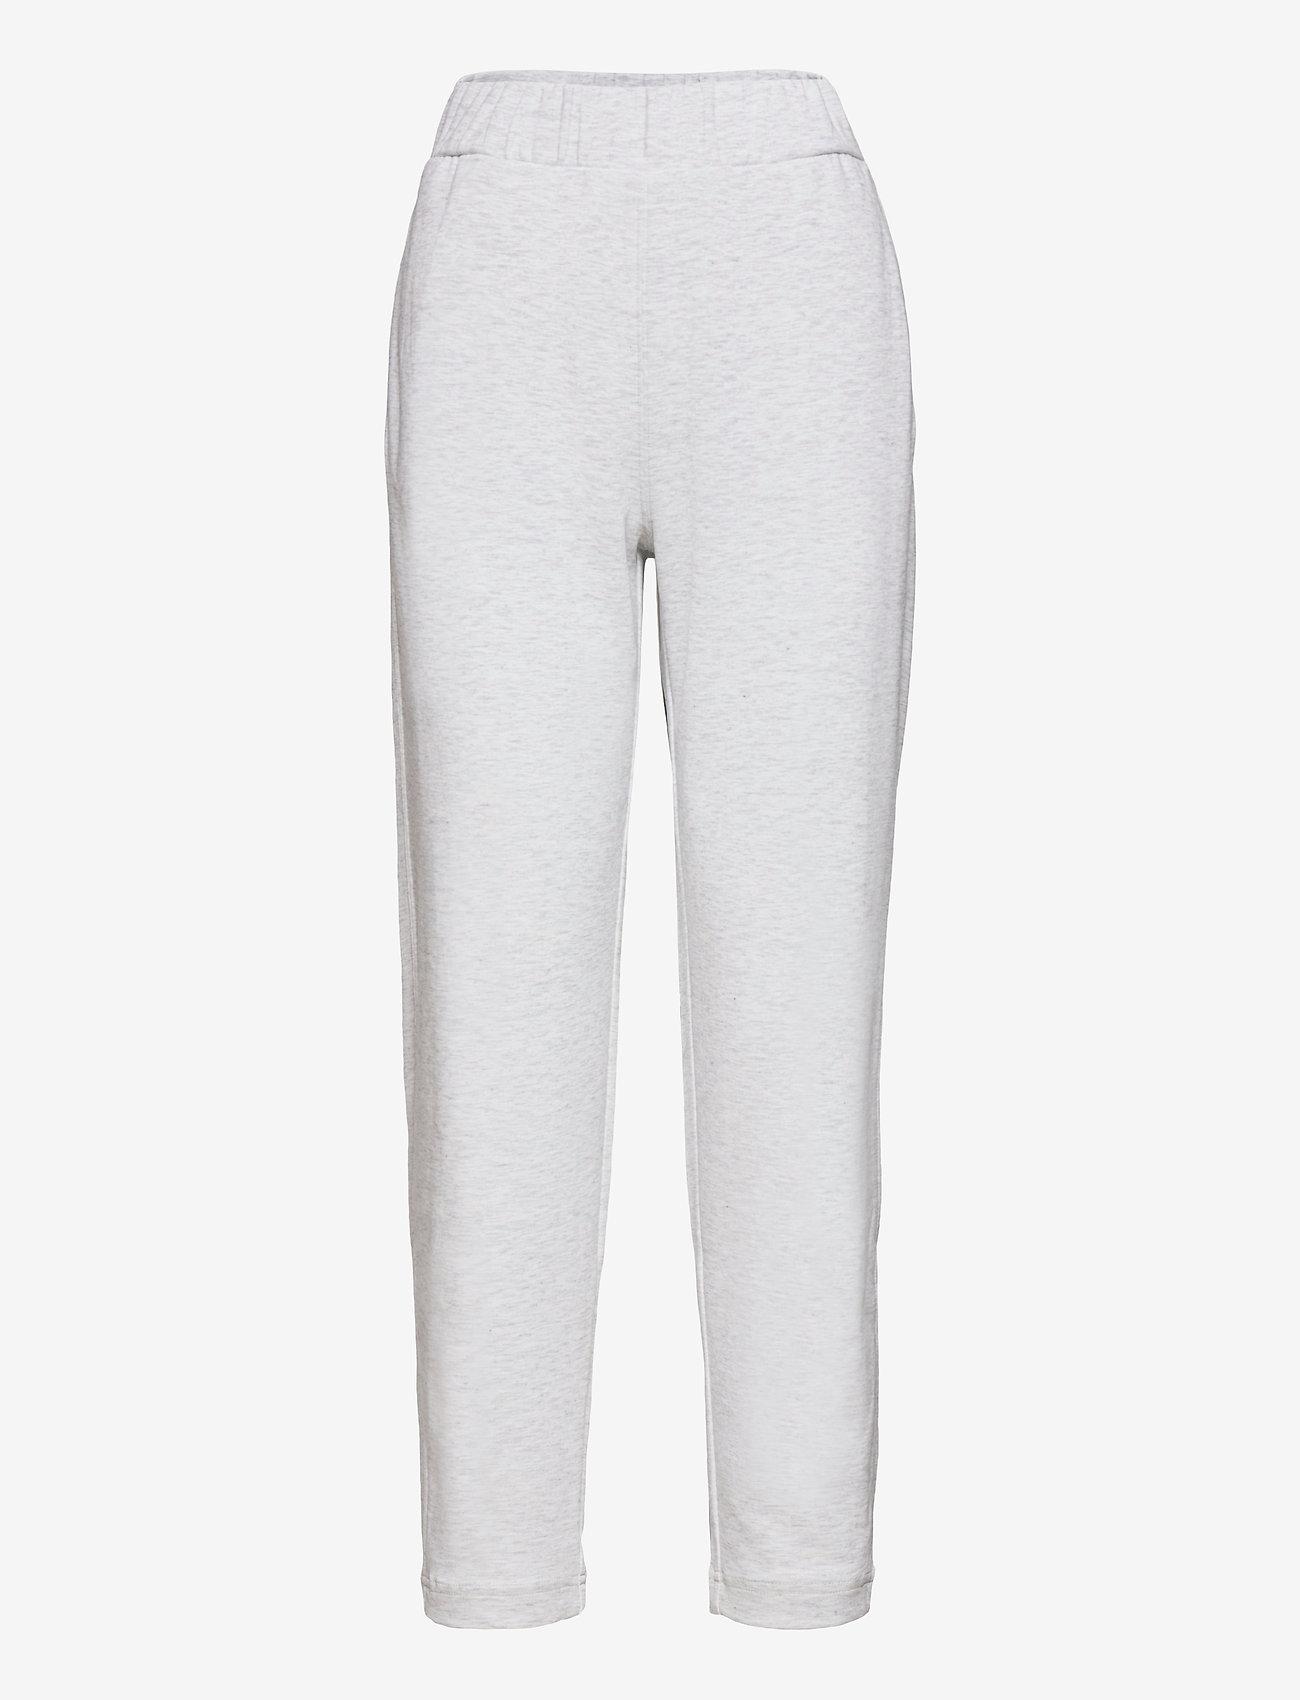 Max Mara Leisure - PESCA - clothing - light grey - 0